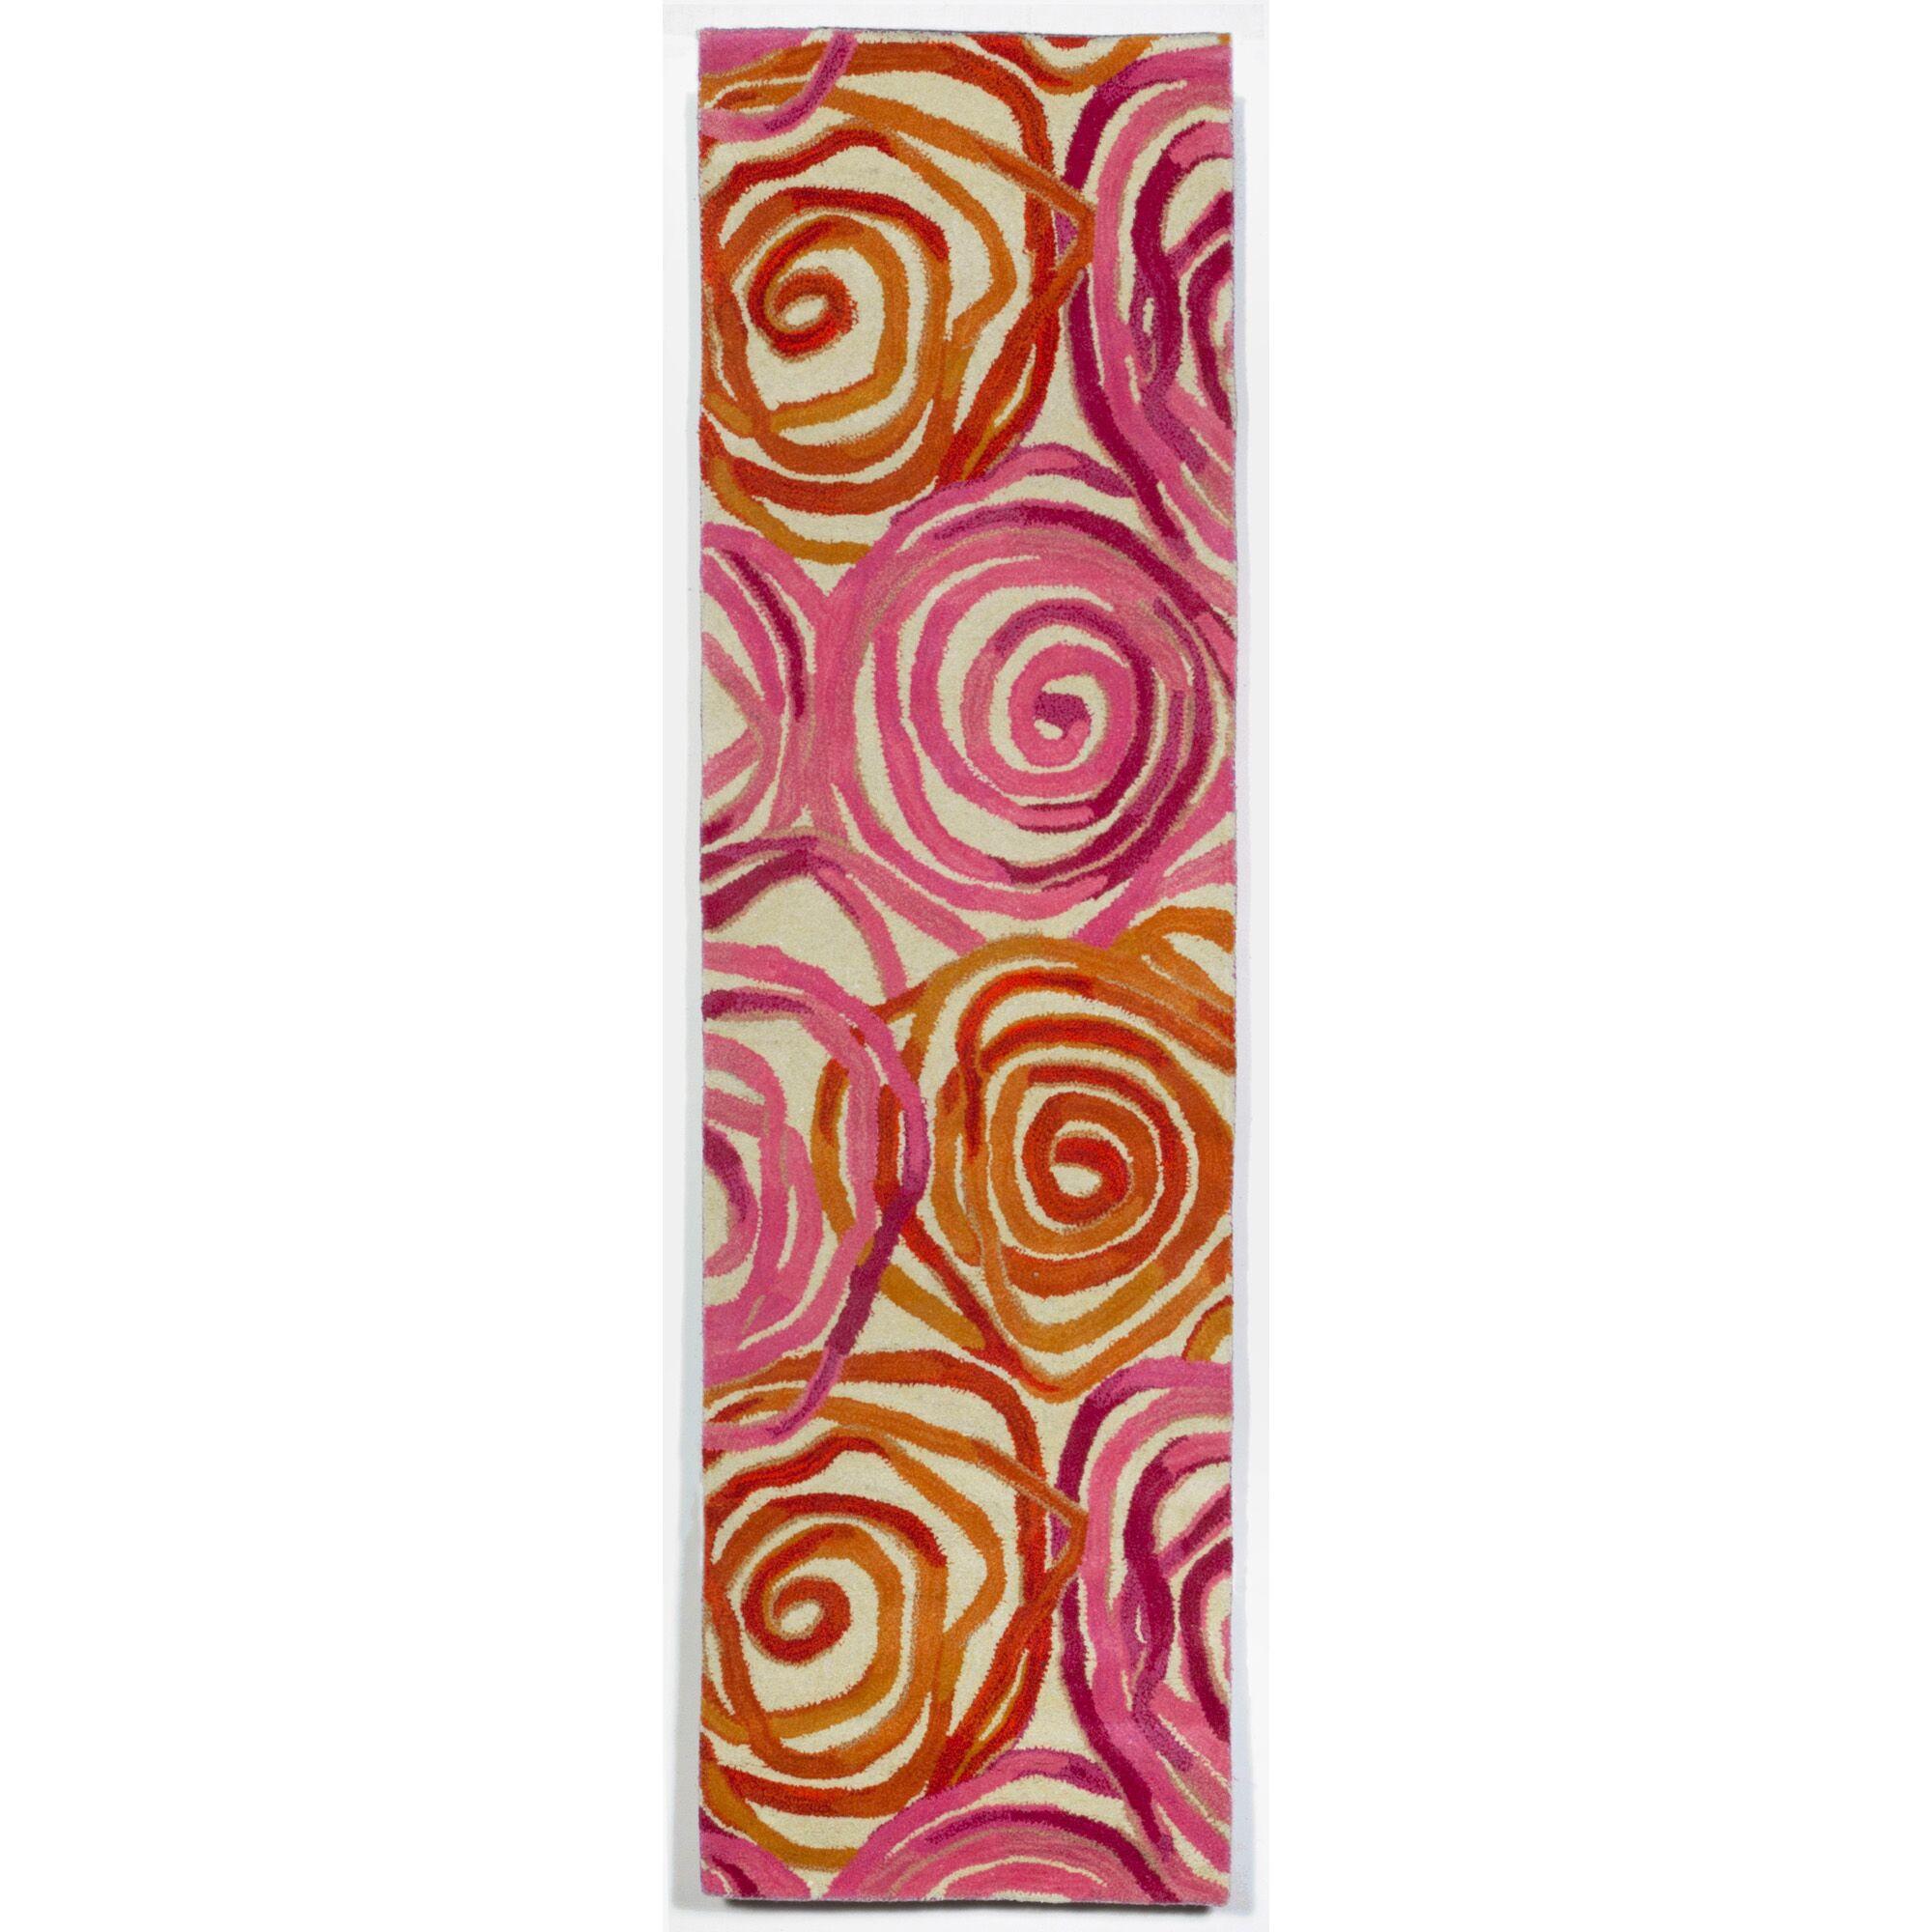 Terrill Rose Sunset Orange/Pink Area Rug Rug Size: Runner 2'3